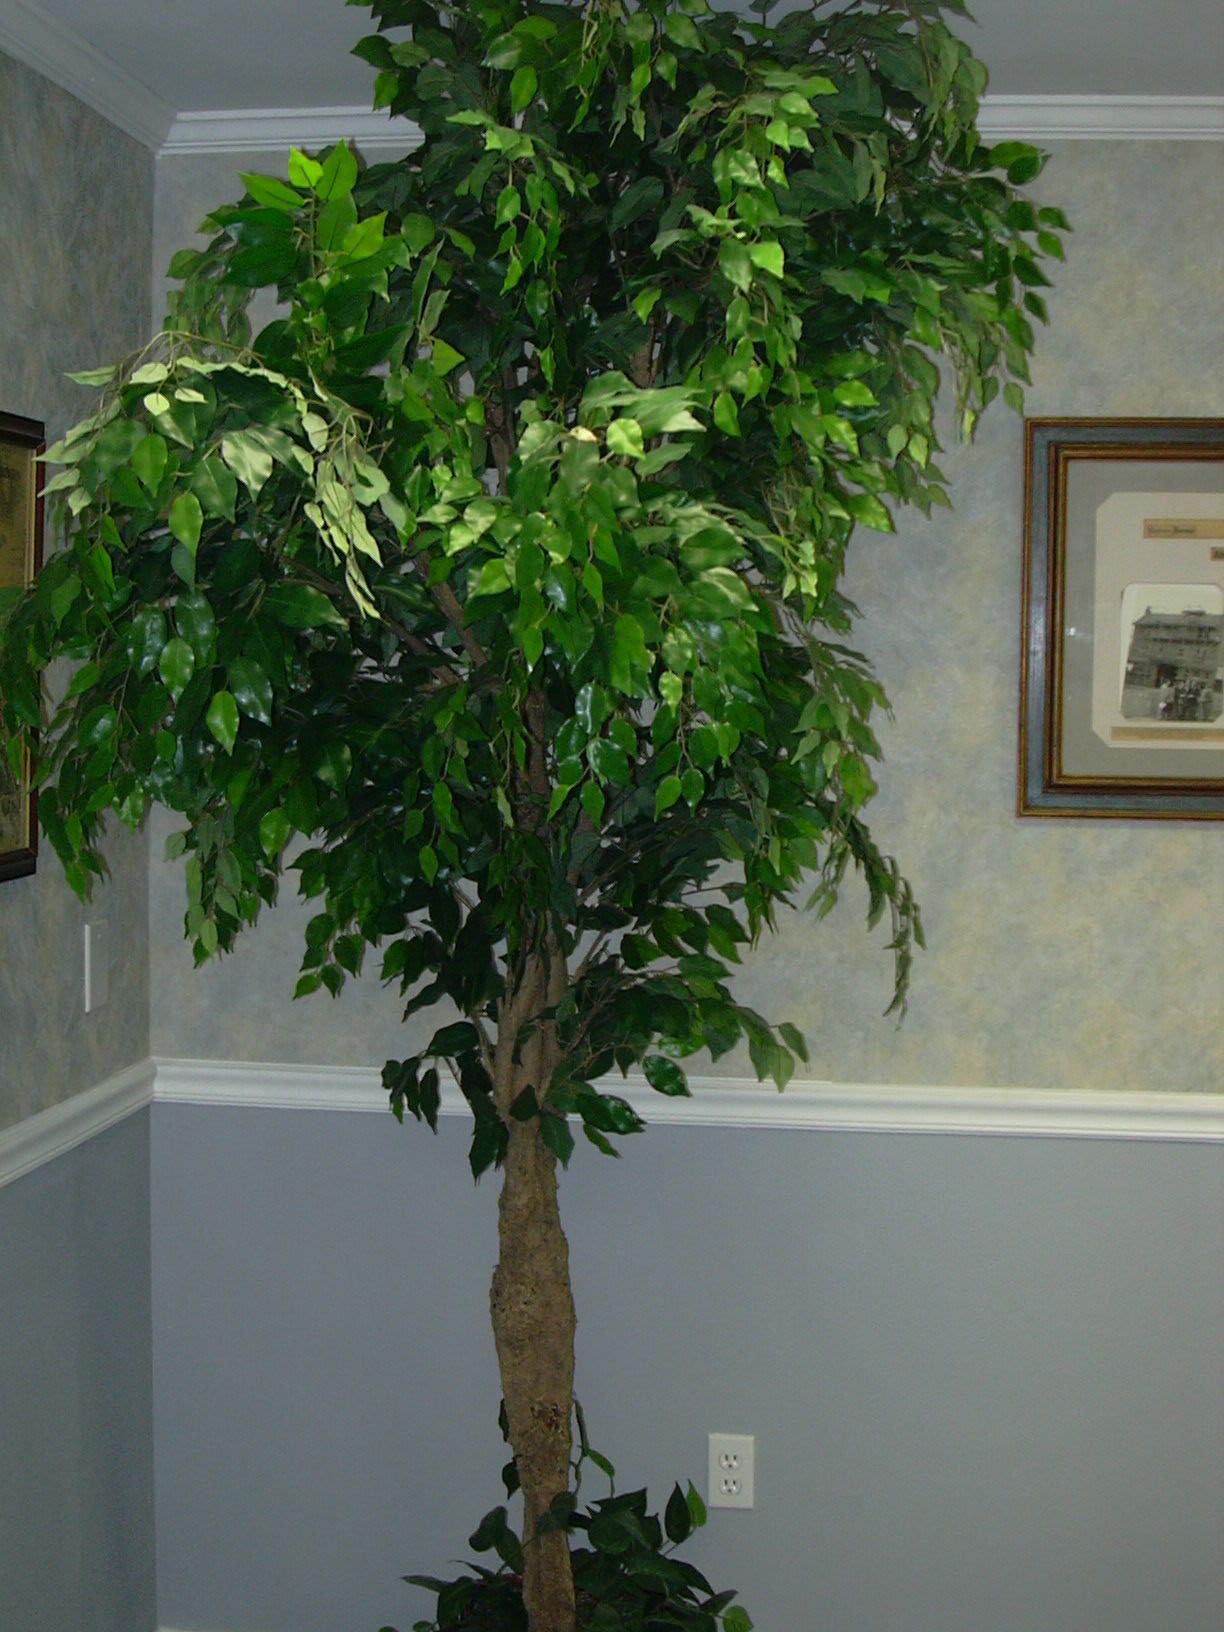 Now that's a Ficus Benjamina. Plantas de interior